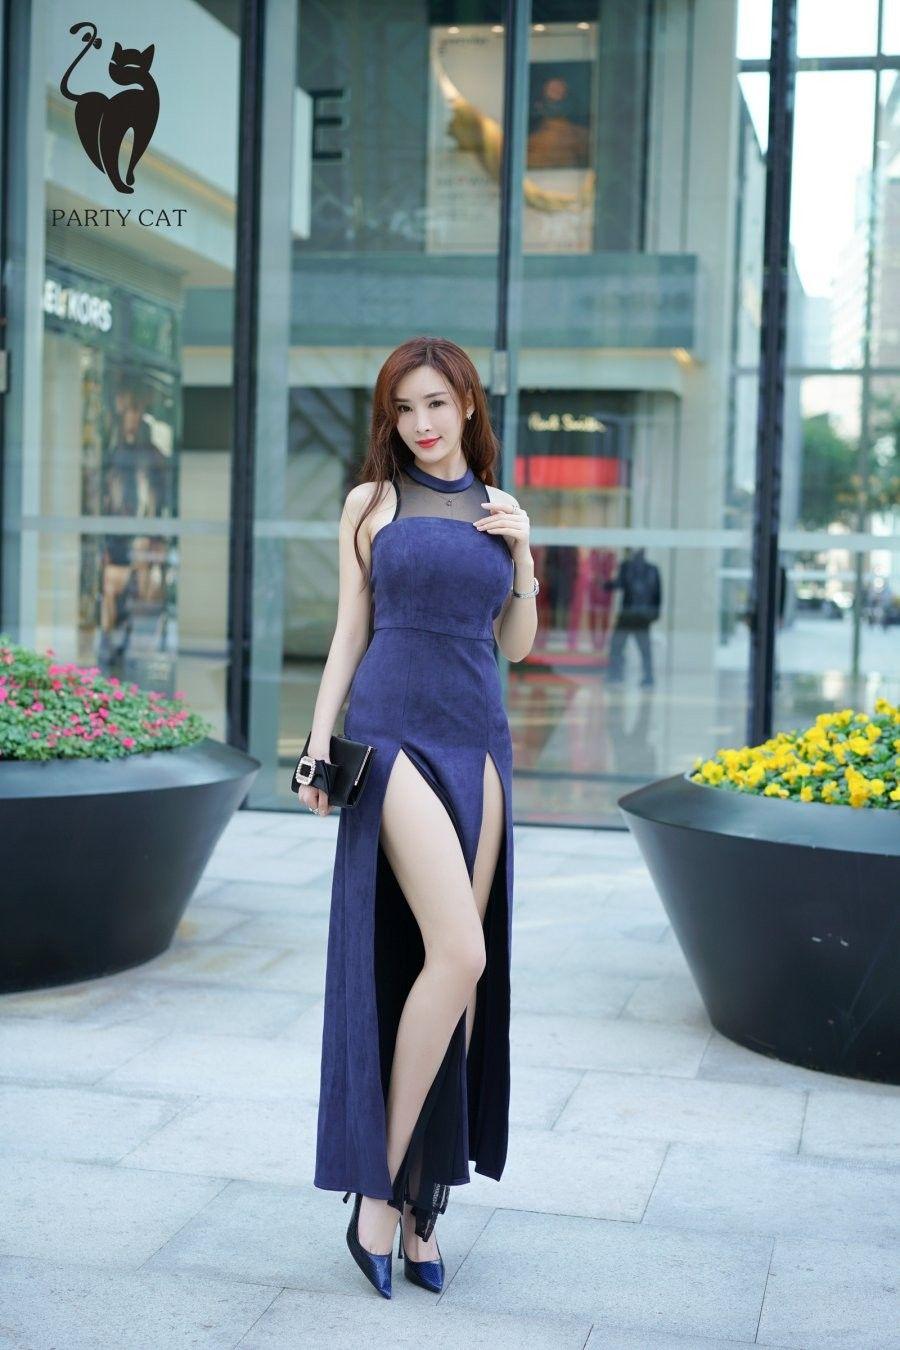 @Miss爱菲儿 http://weibo.com/1901069517/EukzamVyX 1/6   Model